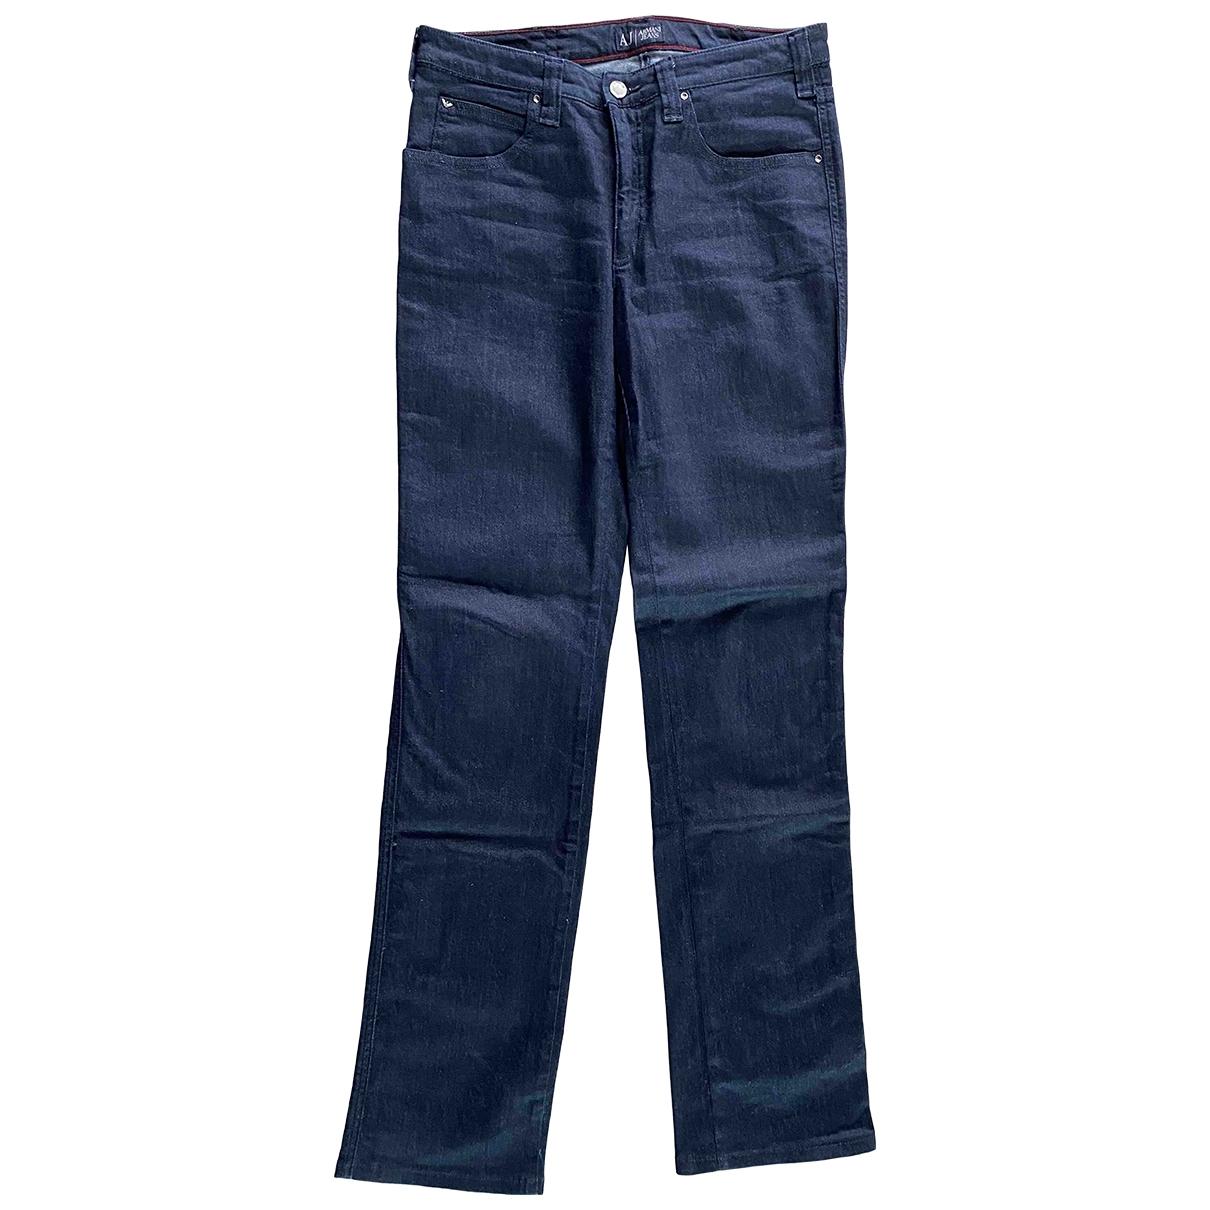 Armani Jeans \N Blue Cotton - elasthane Jeans for Women 42 FR